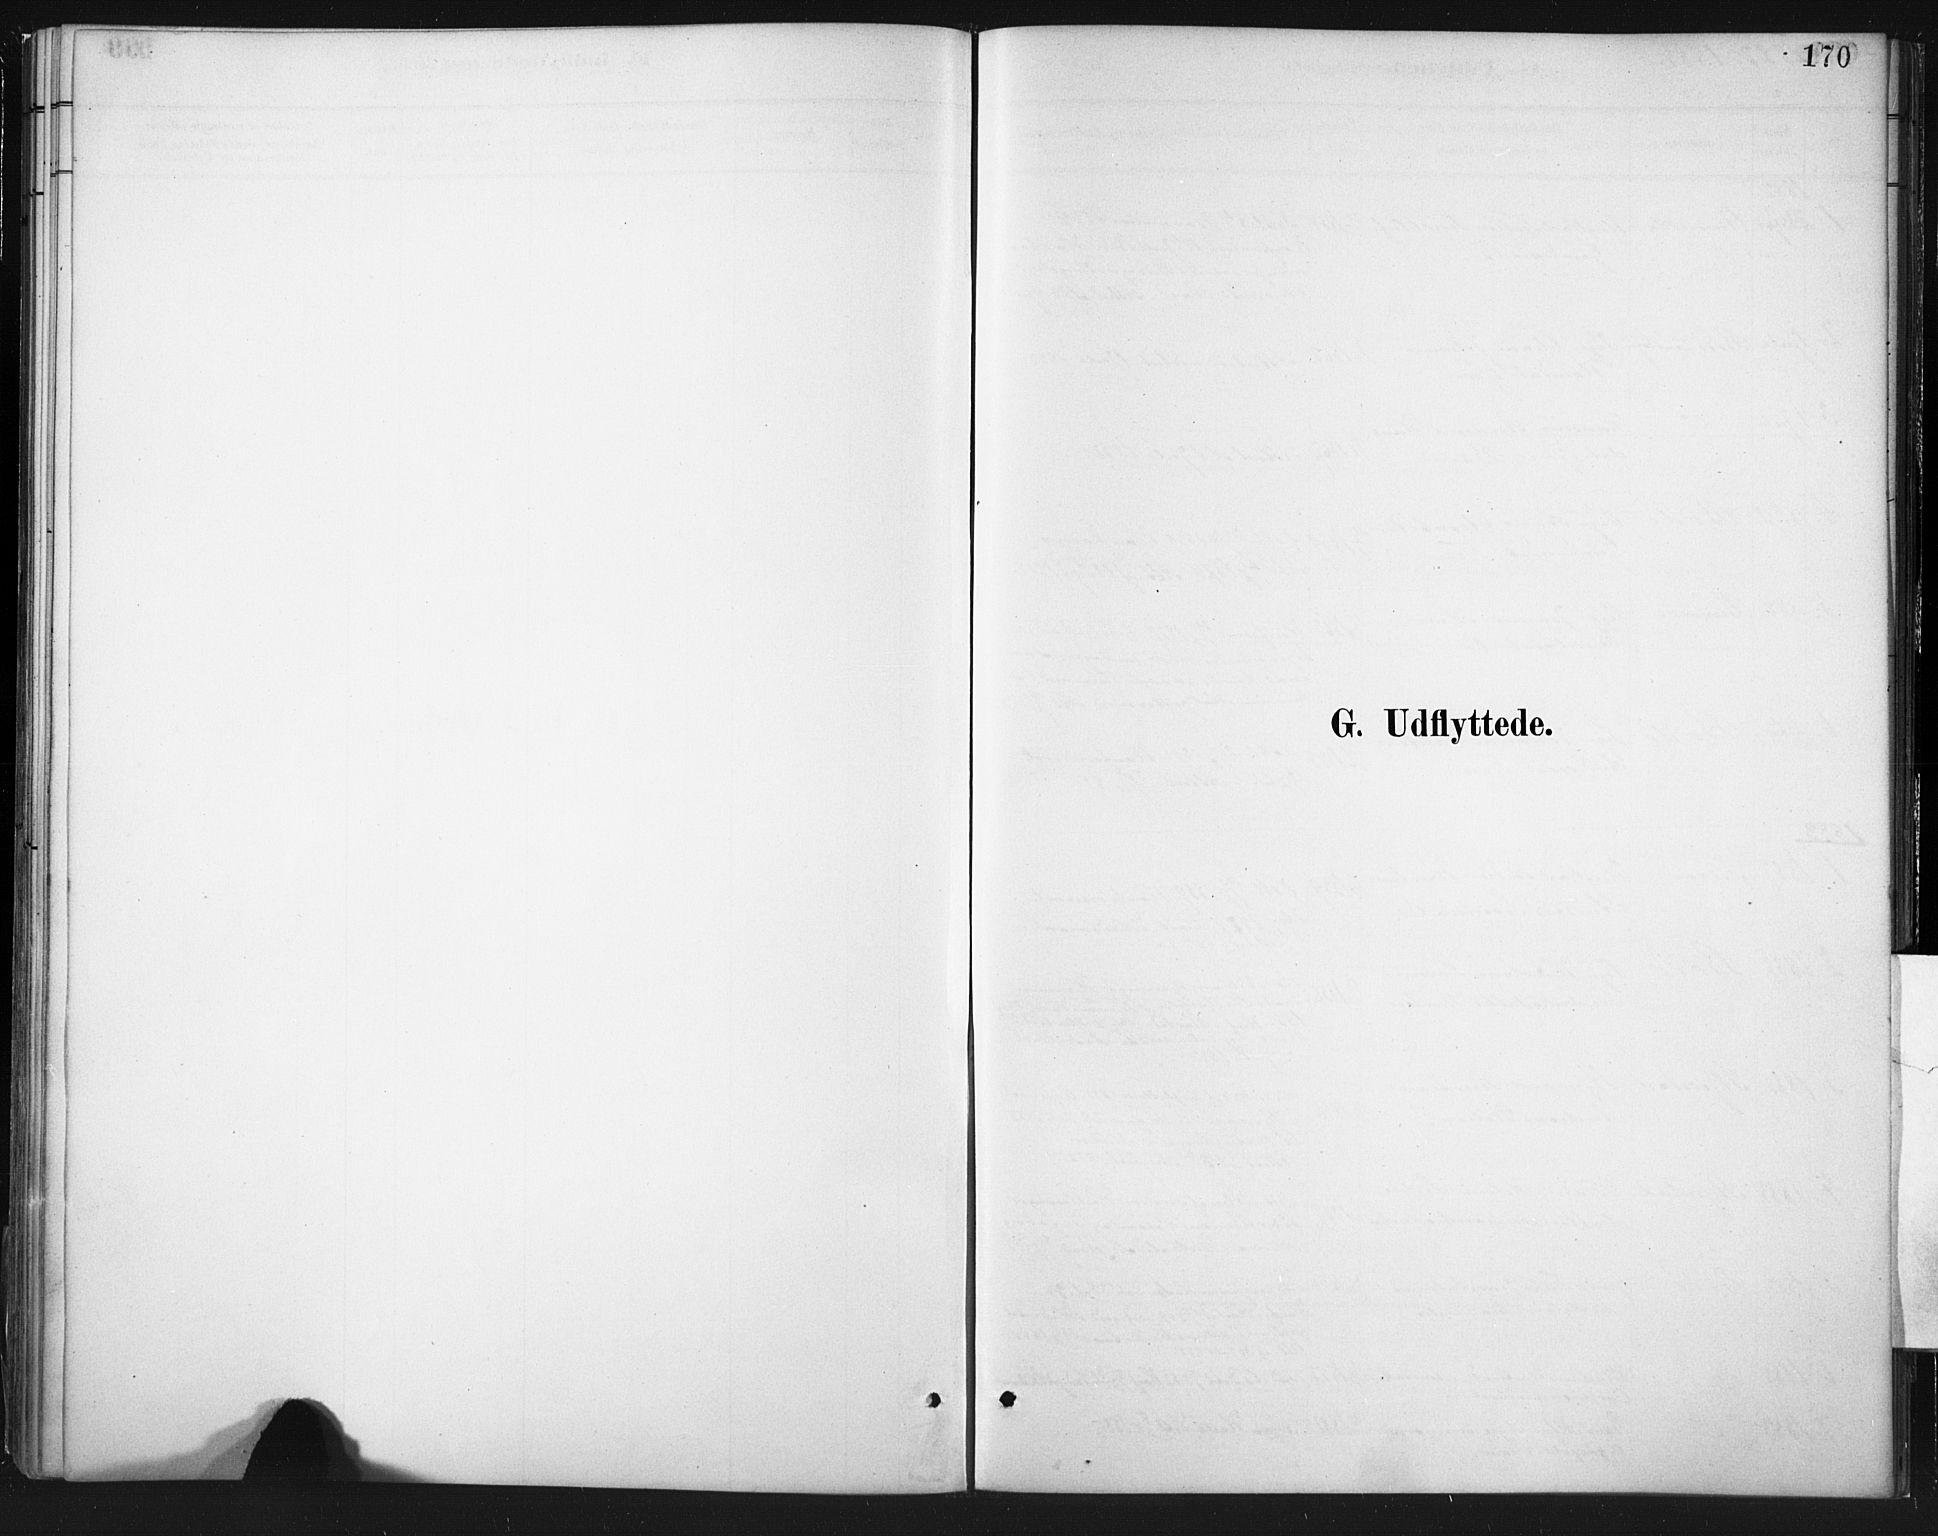 SAT, Ministerialprotokoller, klokkerbøker og fødselsregistre - Nordland, 803/L0071: Ministerialbok nr. 803A01, 1881-1897, s. 170